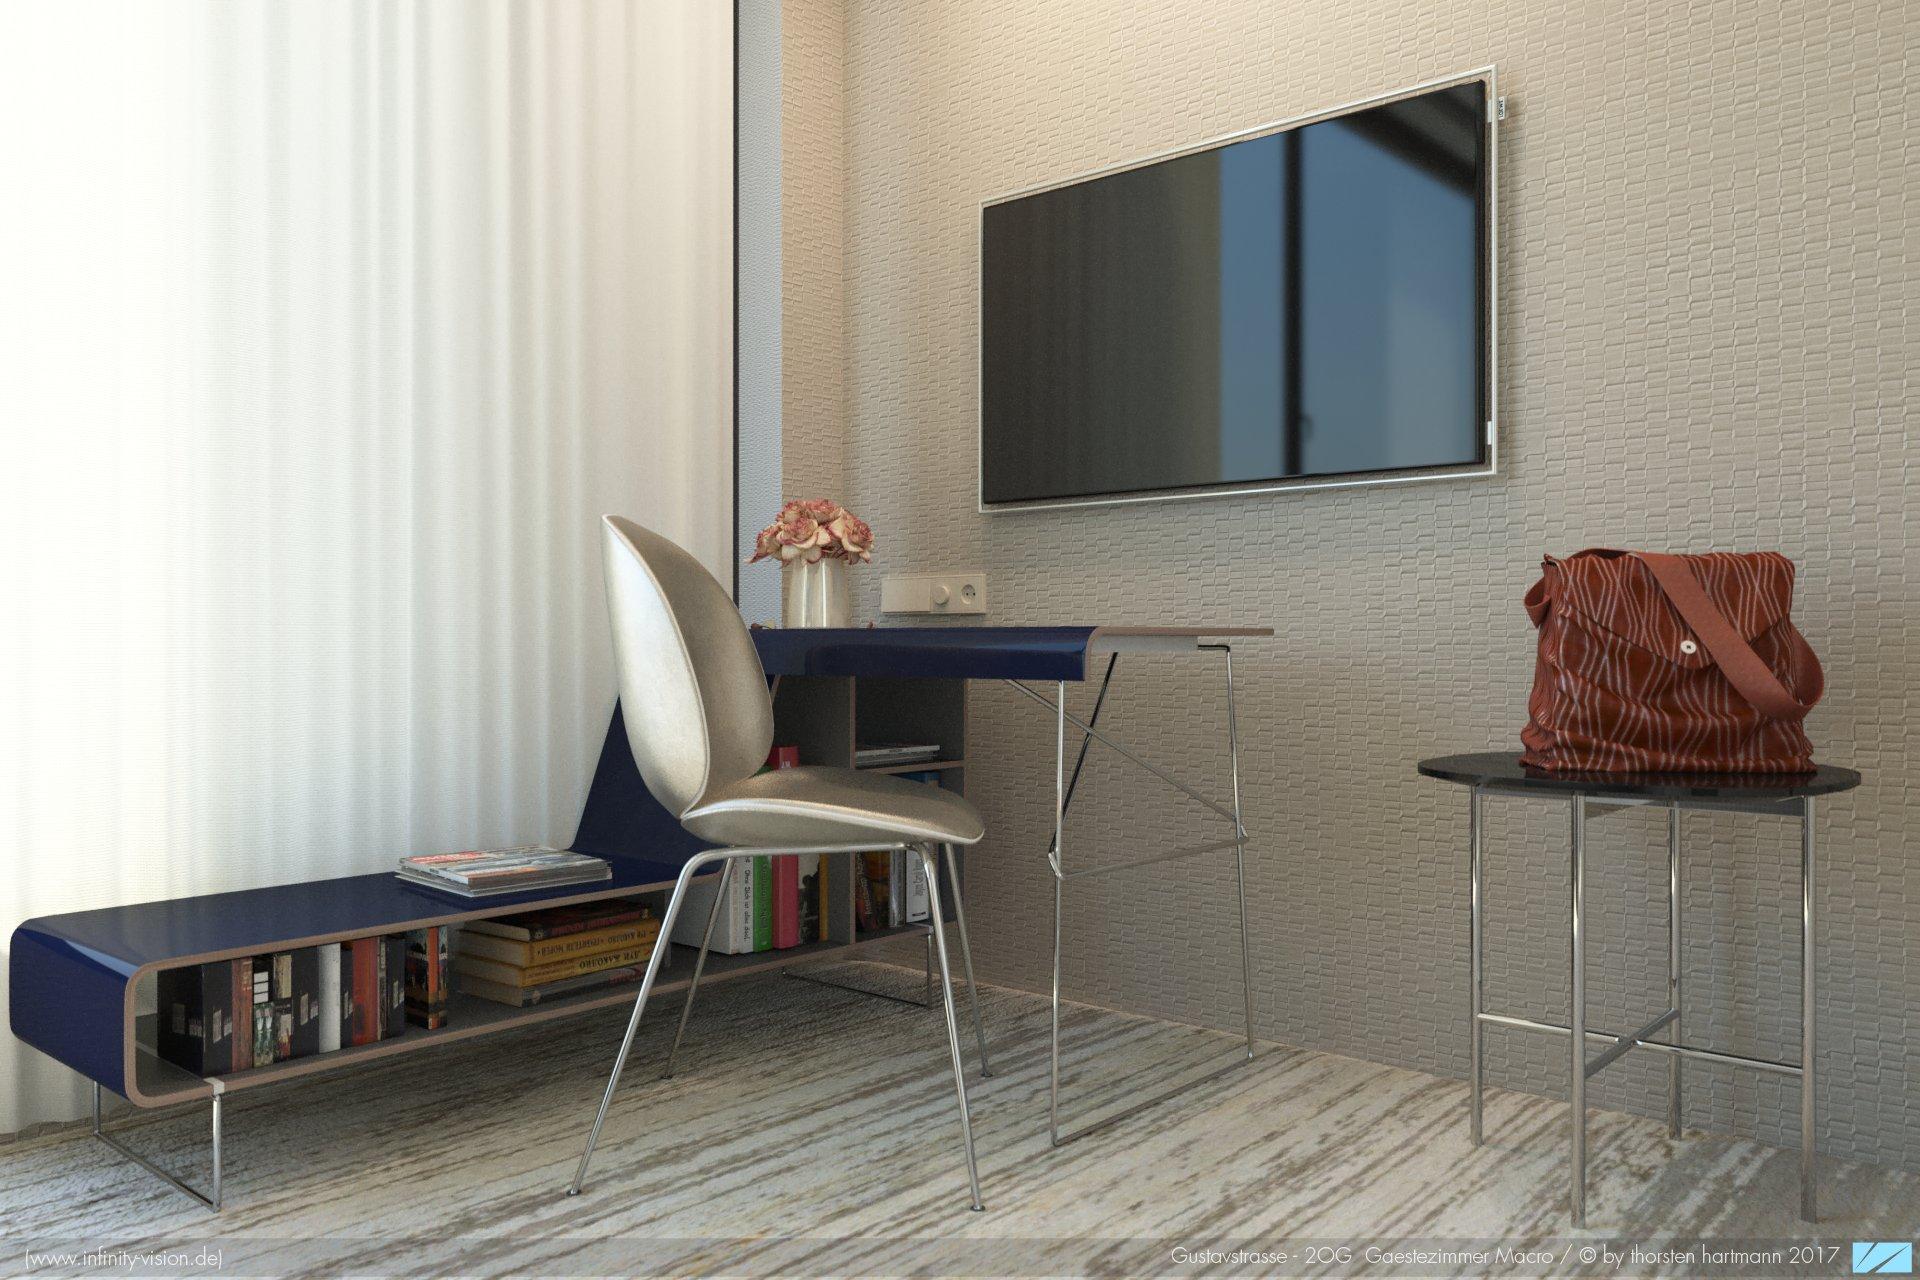 Gustavstrasse / Guest room macro